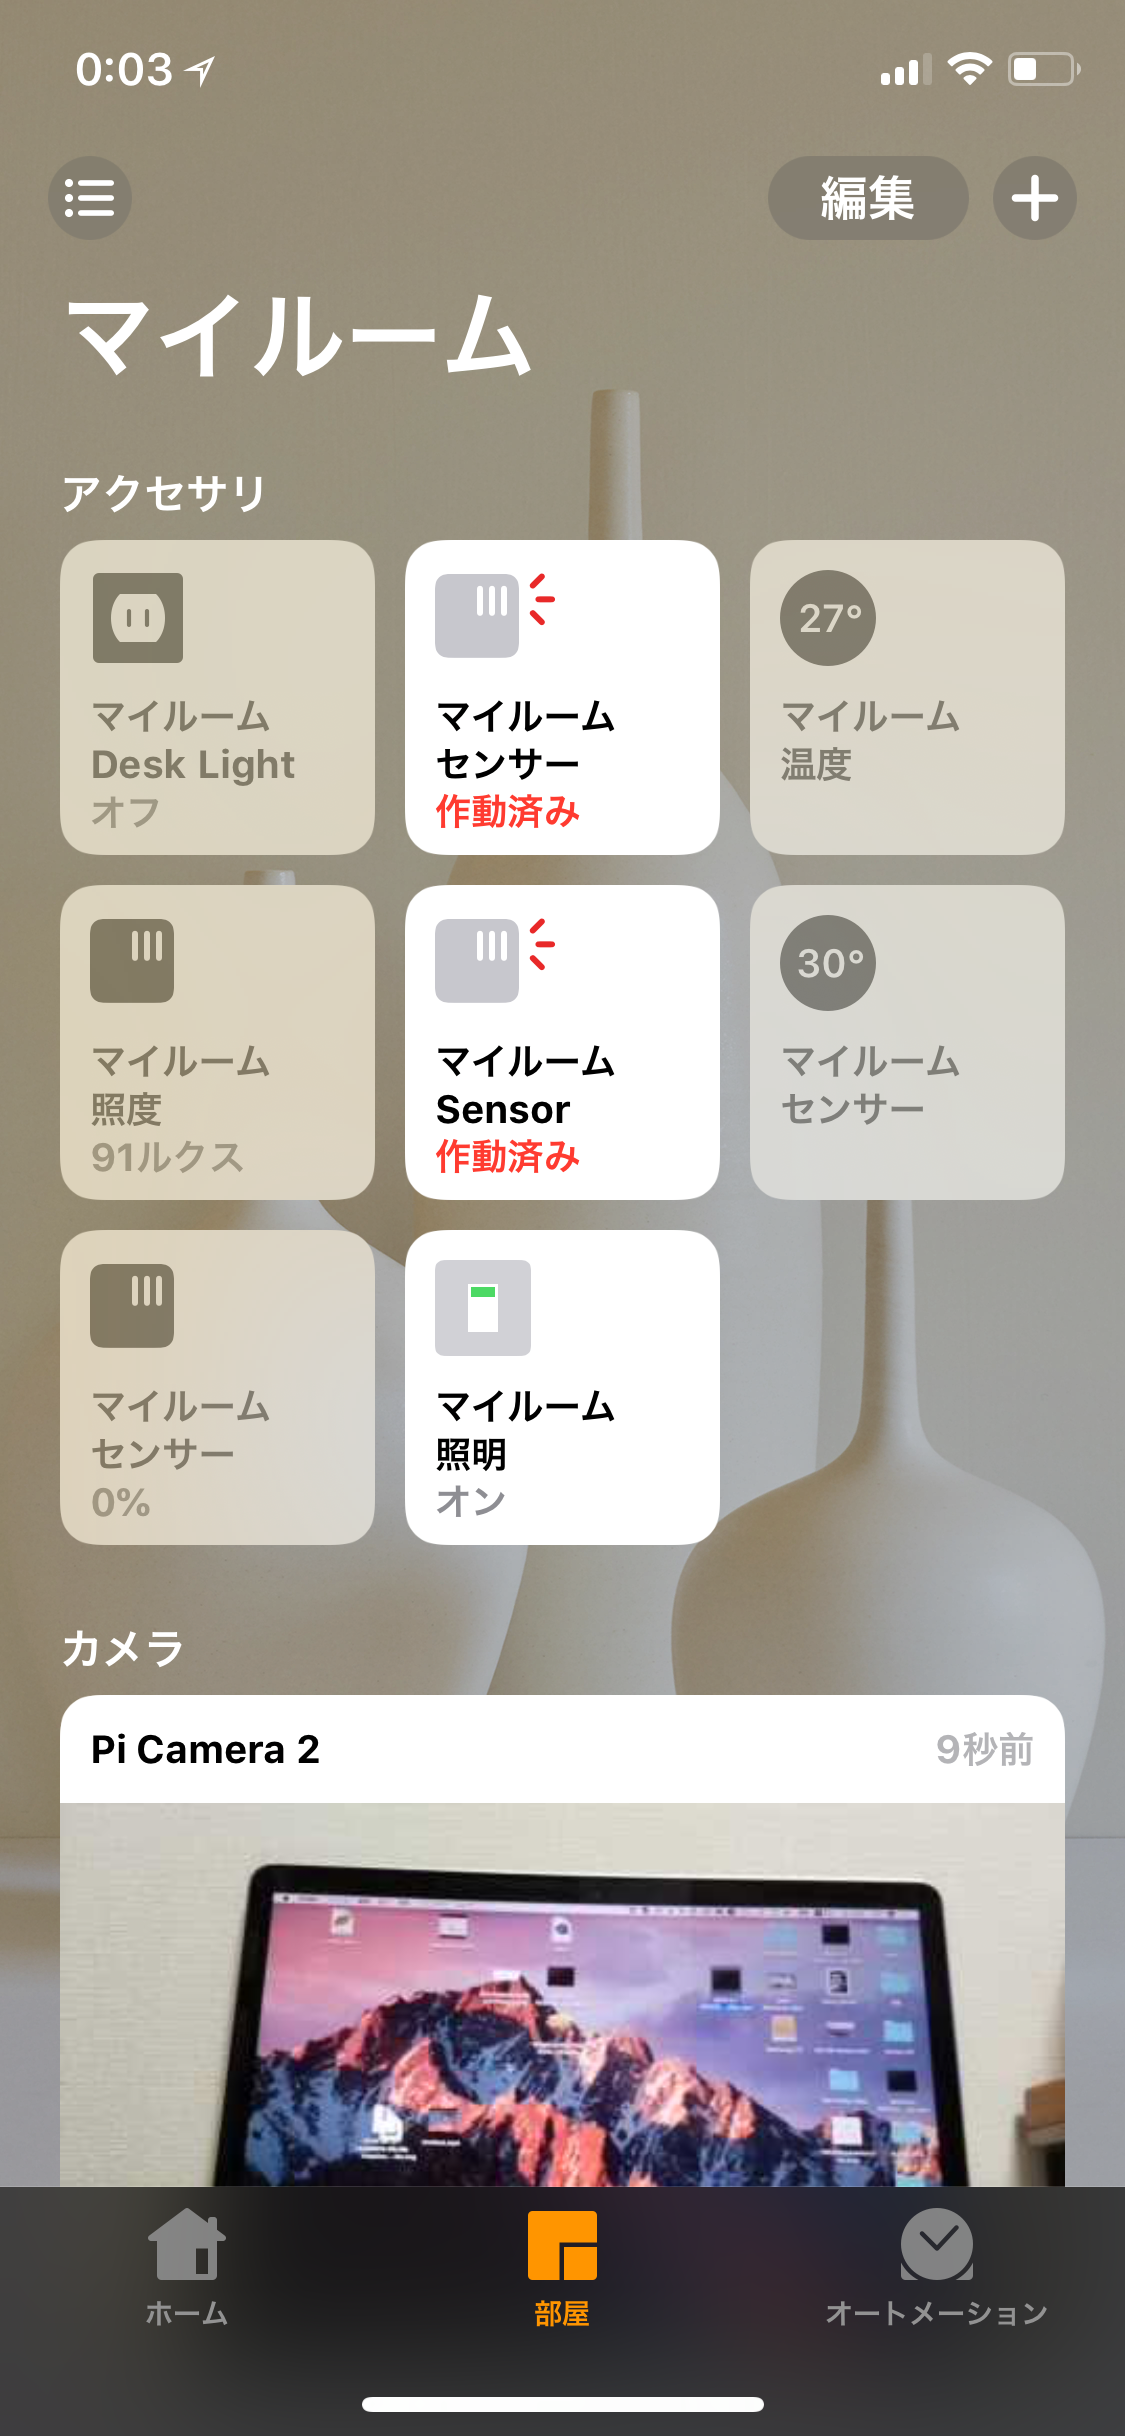 Raspberry Pi Camera on Home.app